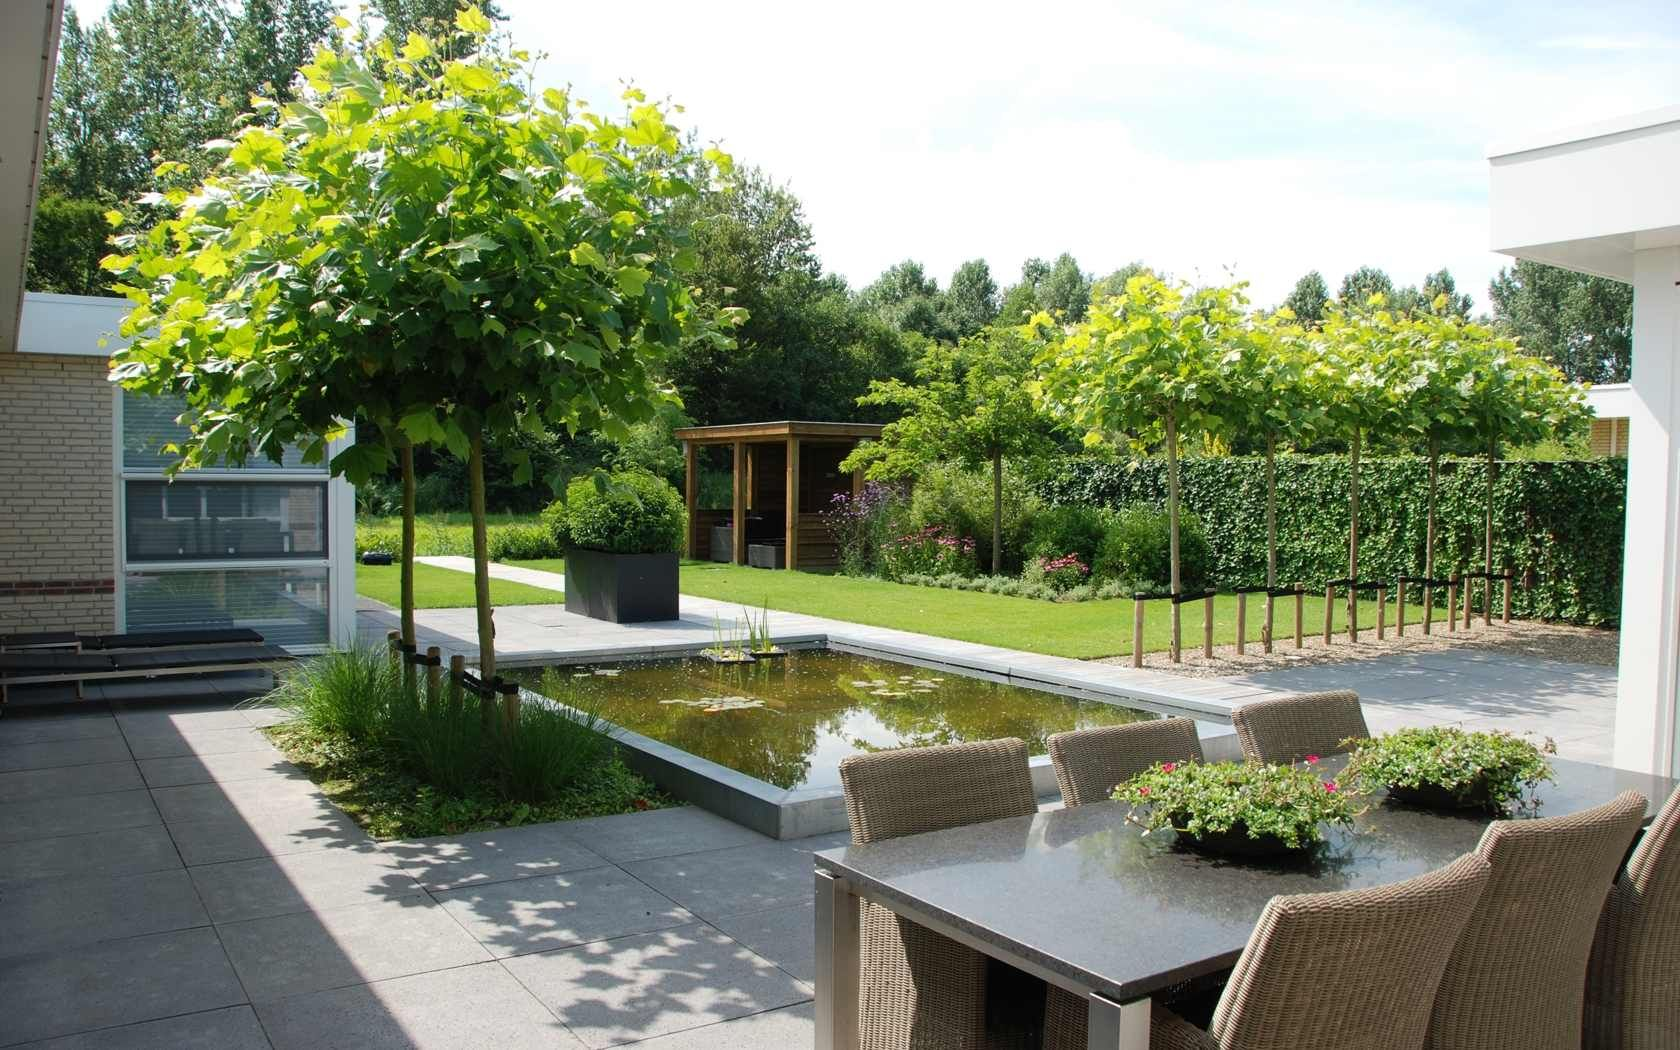 Van veen tuinontwerpen hoorn strakke lounge tuin lifs for Moderne kleine tuin